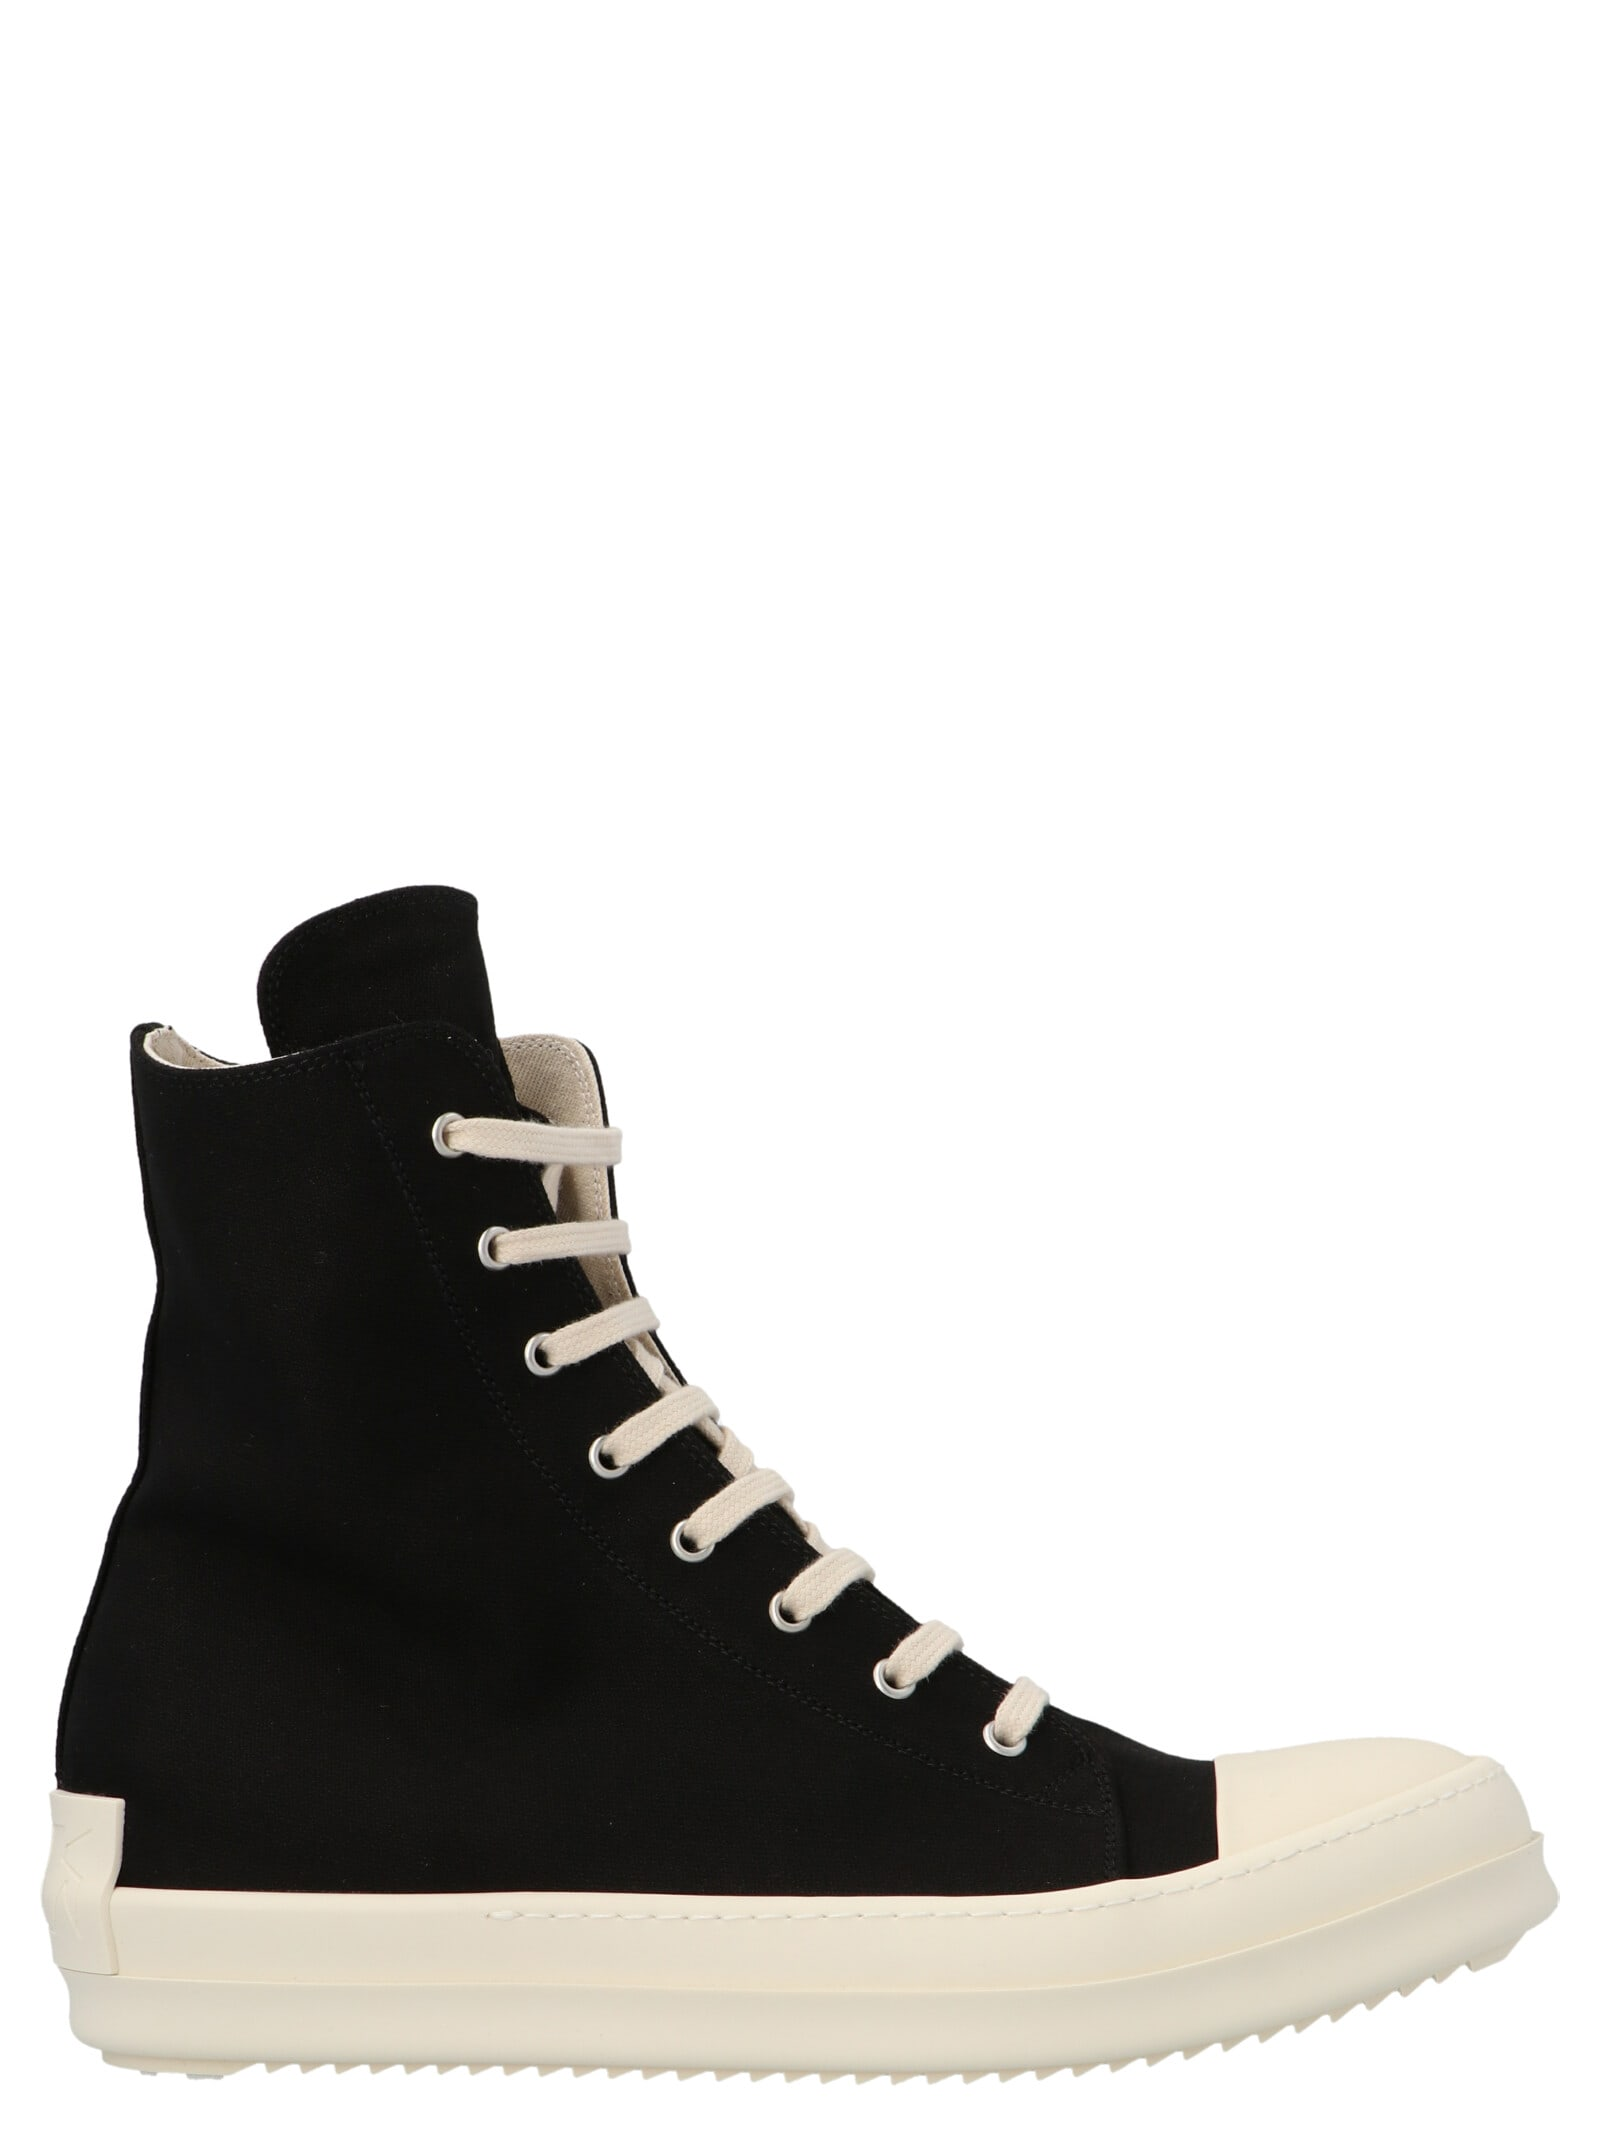 sneaks Shoes